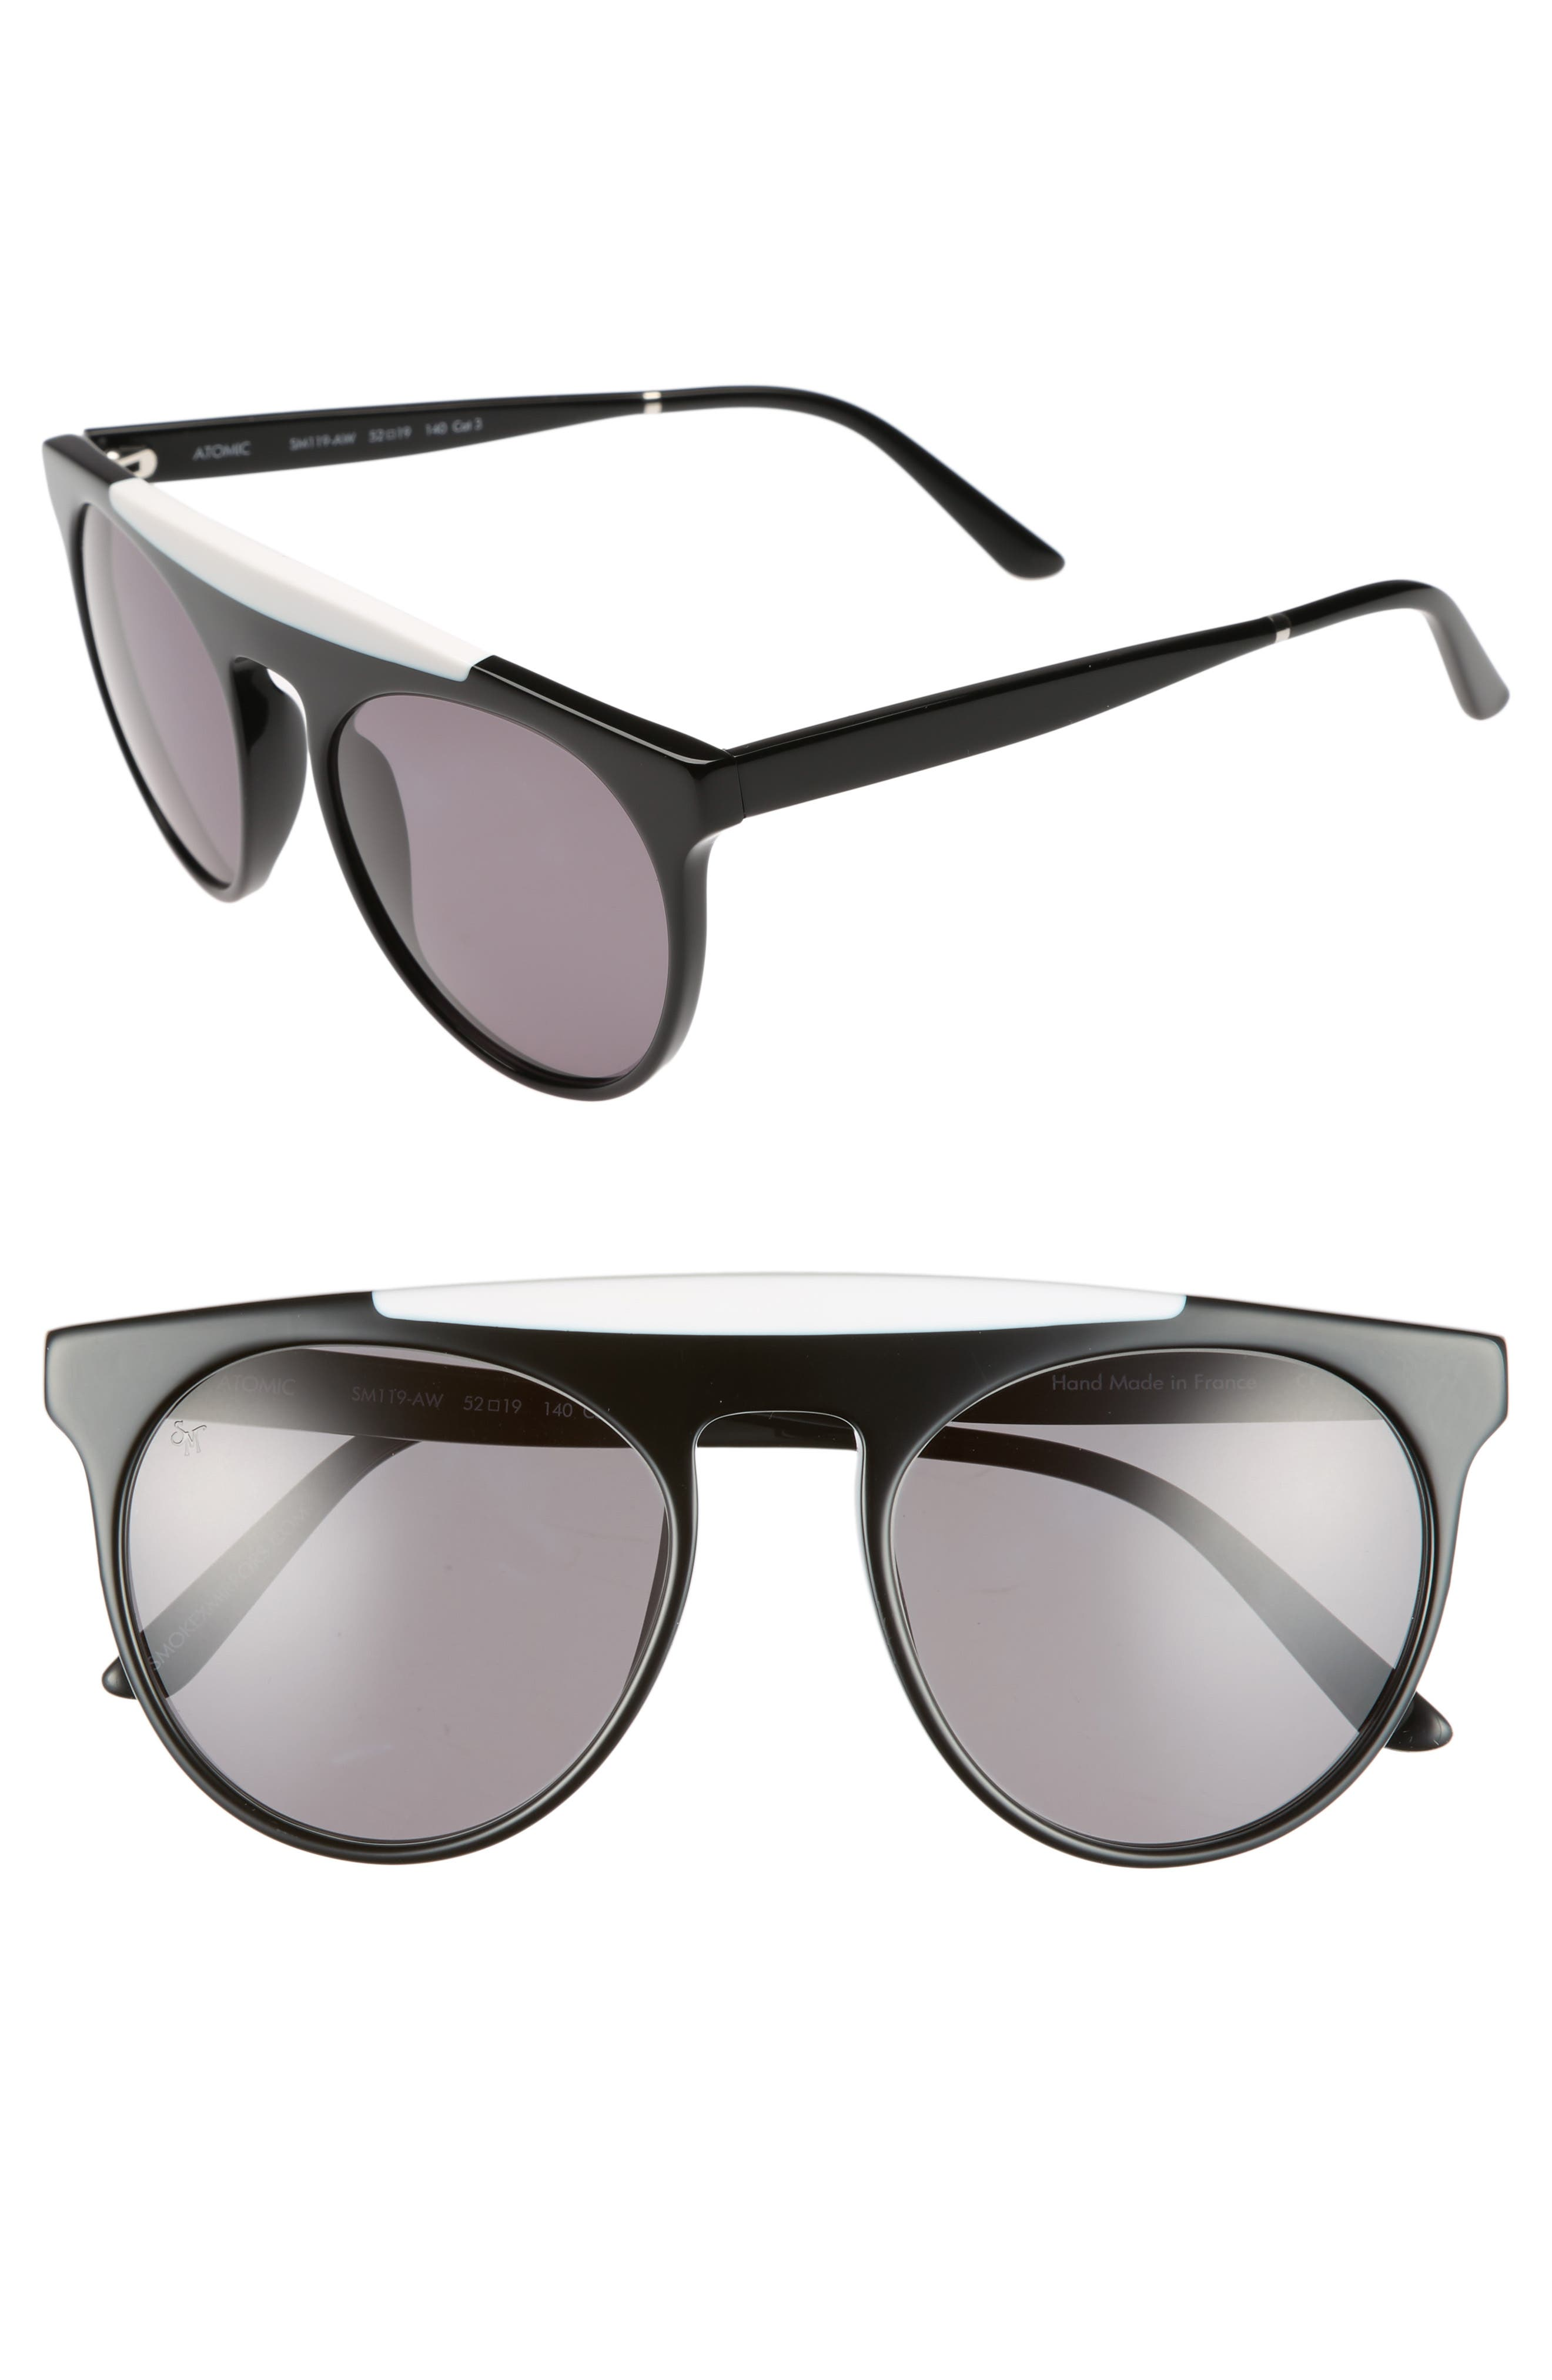 Main Image - Smoke x Mirrors Atomic 52mm Sunglasses